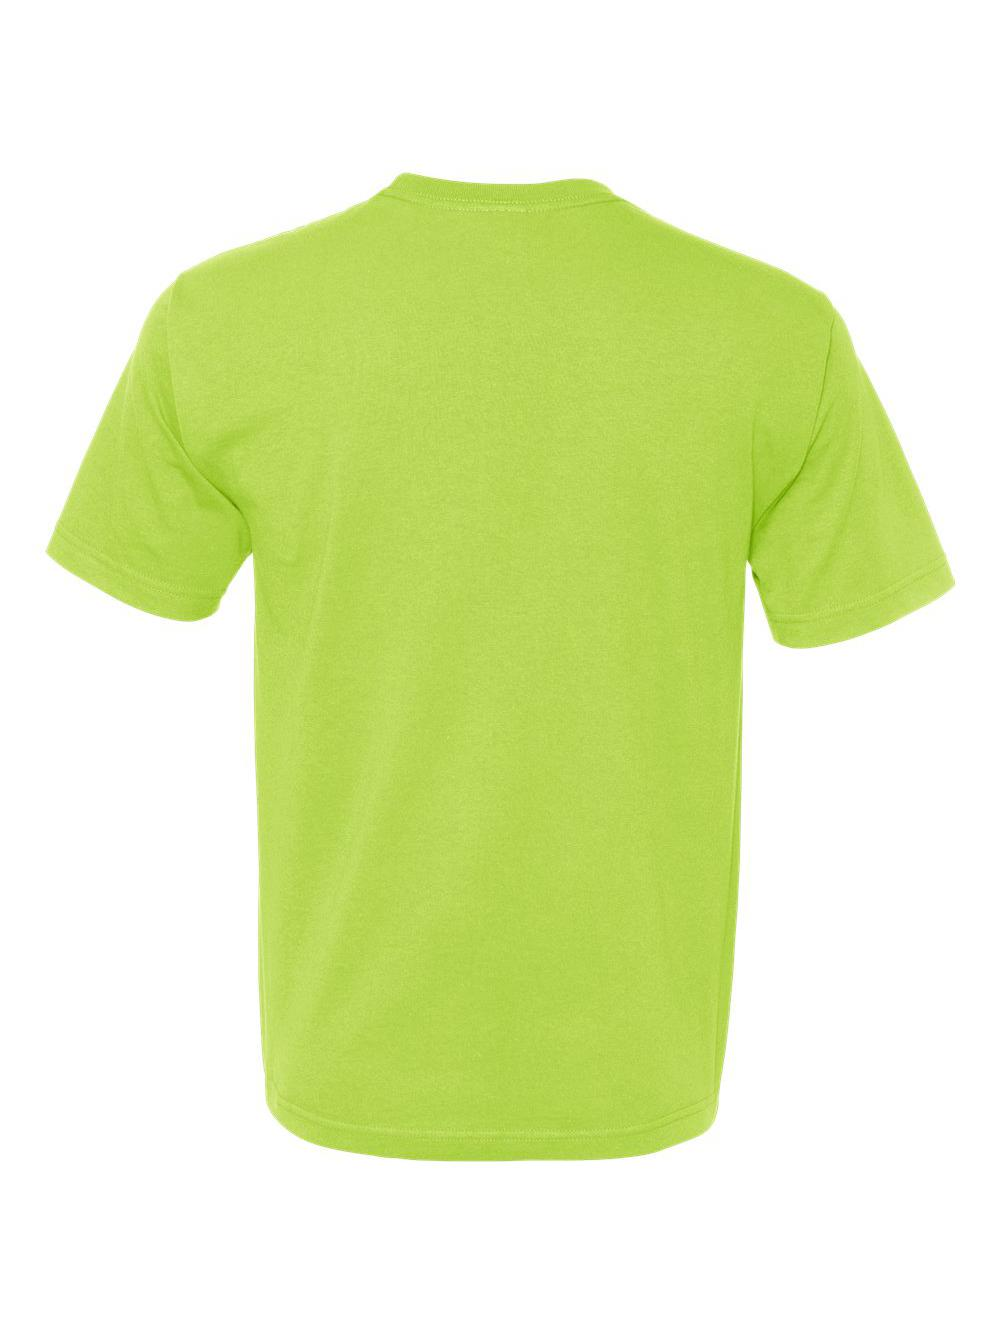 Bayside-USA-Made-100-Cotton-Short-Sleeve-T-Shirt-5040 thumbnail 22